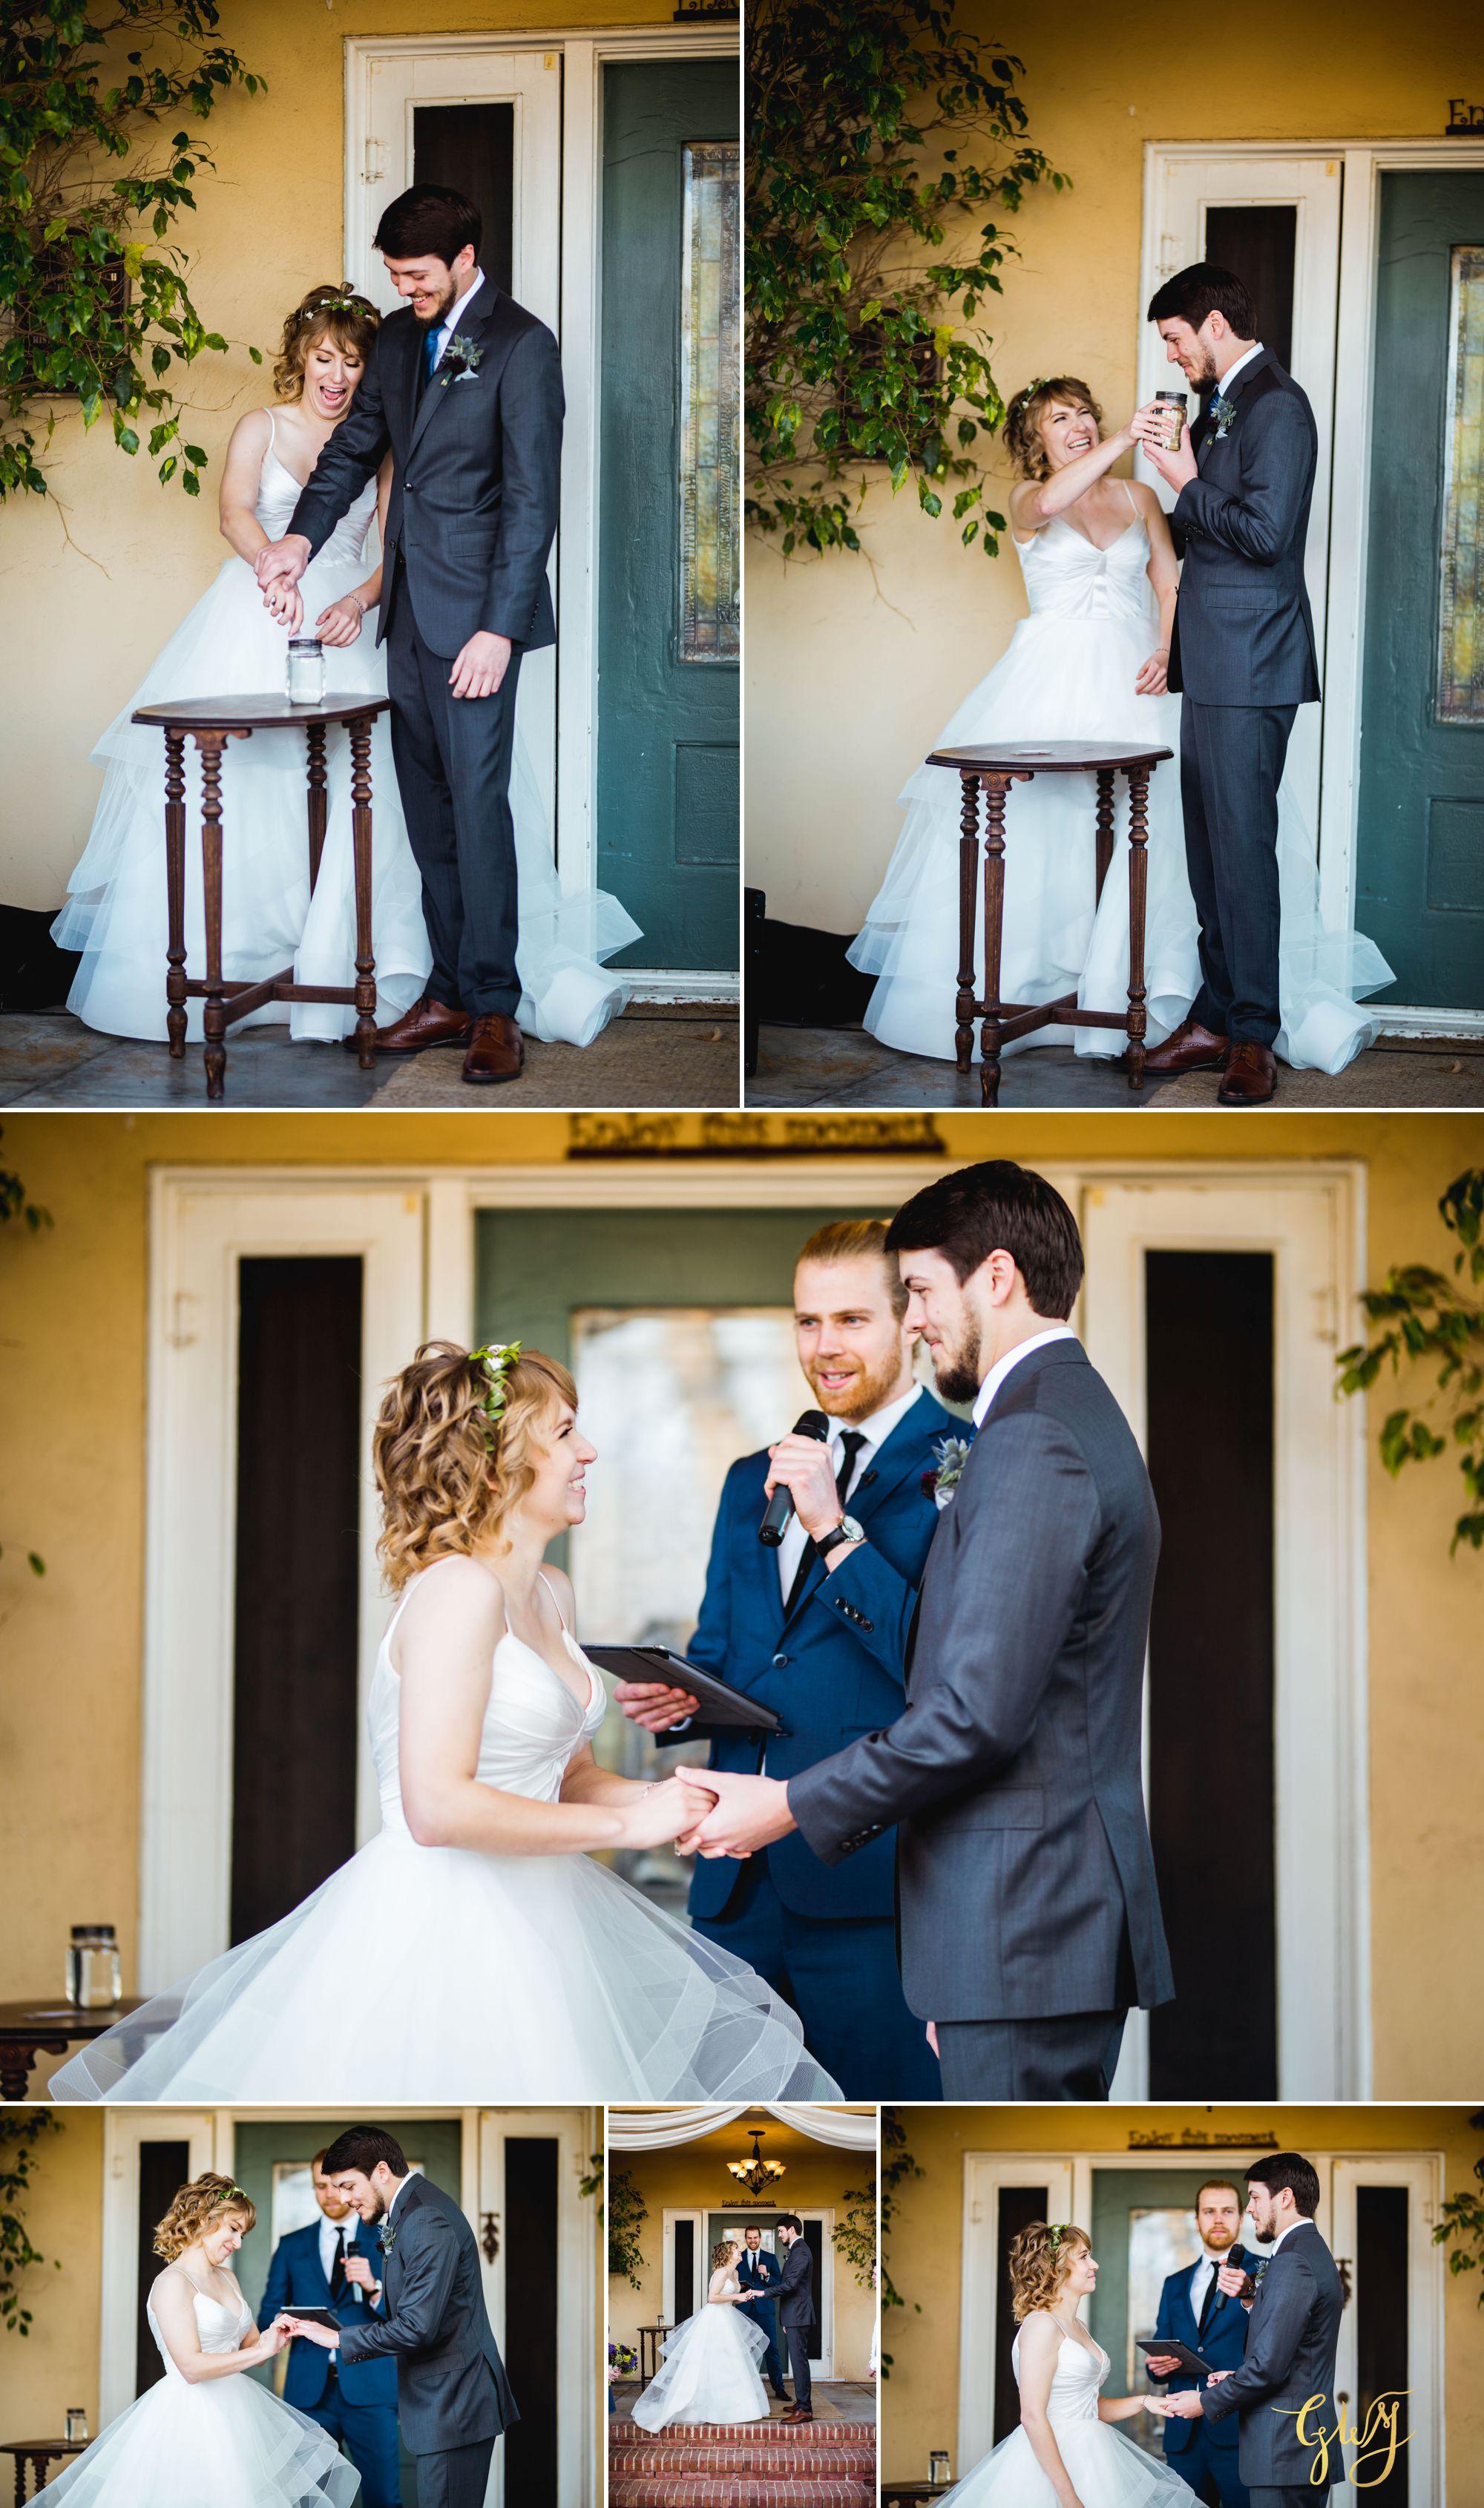 Garrett + Michelle's French Estate Orange County Spring Wedding by Glass Woods Media 26.jpg